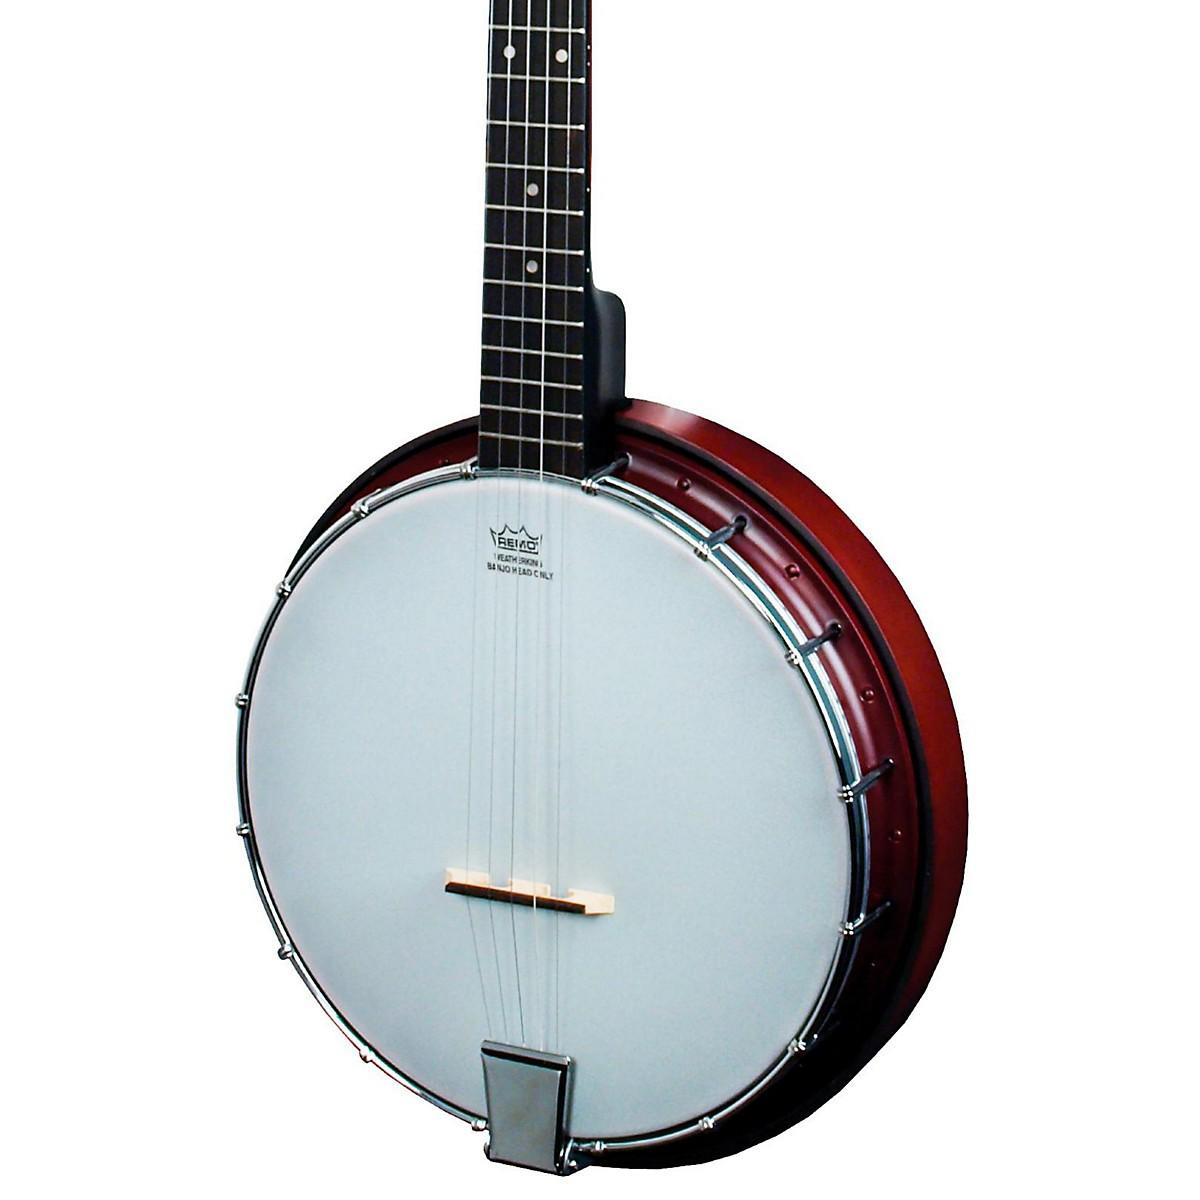 Morgan Monroe Rocky Top RT-B01L Hoedown Left-Handed Banjo